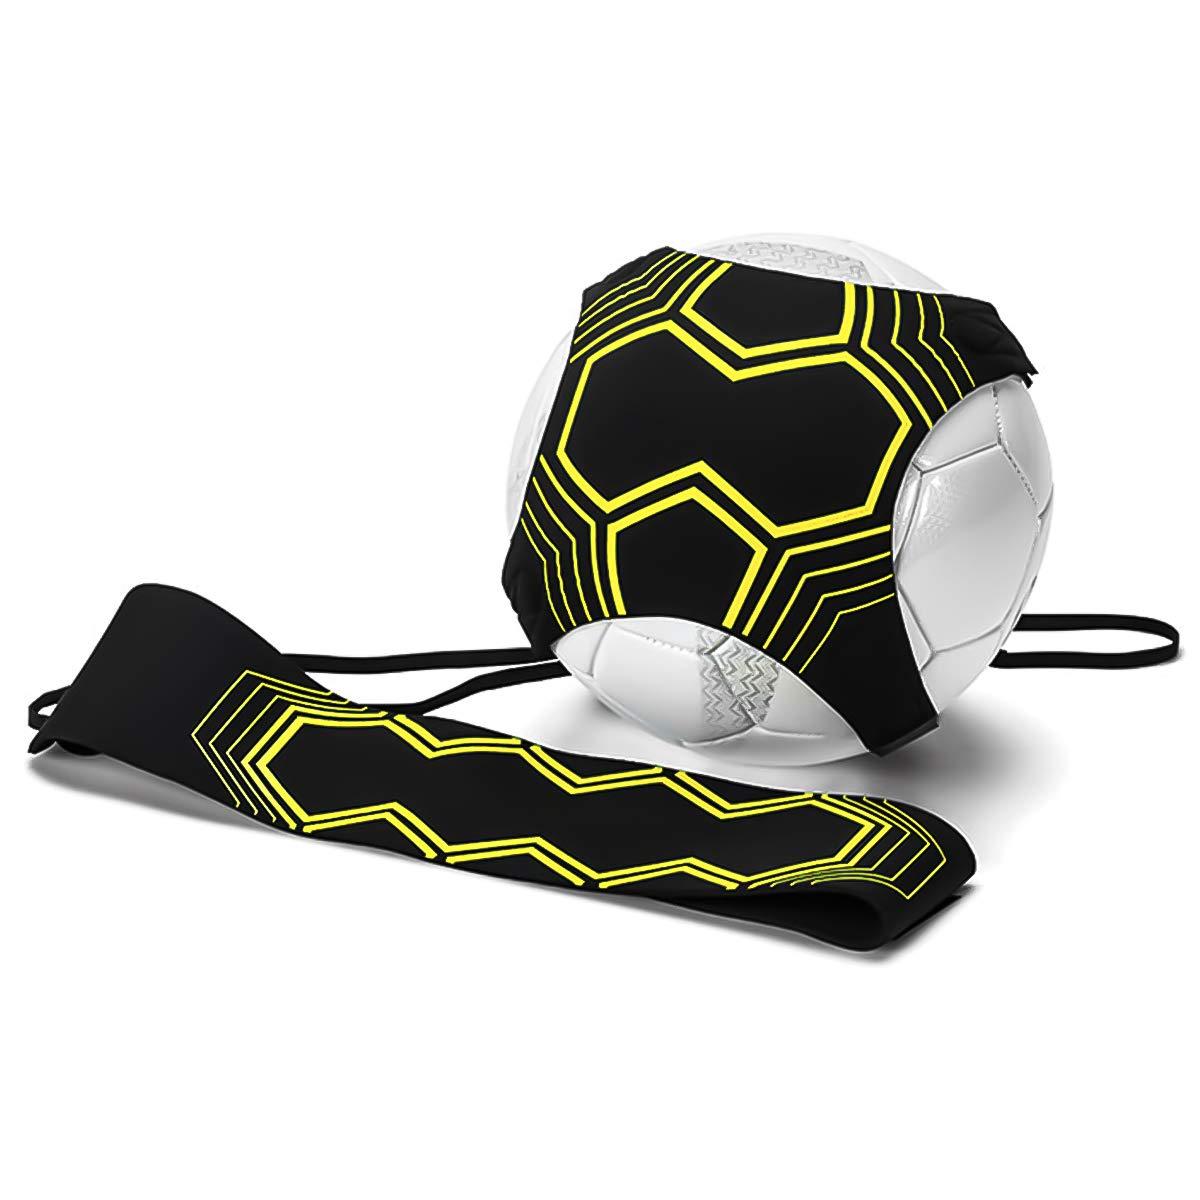 Ulable Fuß ball Kick Trainer Fuß ball-Solo-Skill-Ü bungs-Trainingshilfe zur Verbesserung der Fuß ballfä higkeite